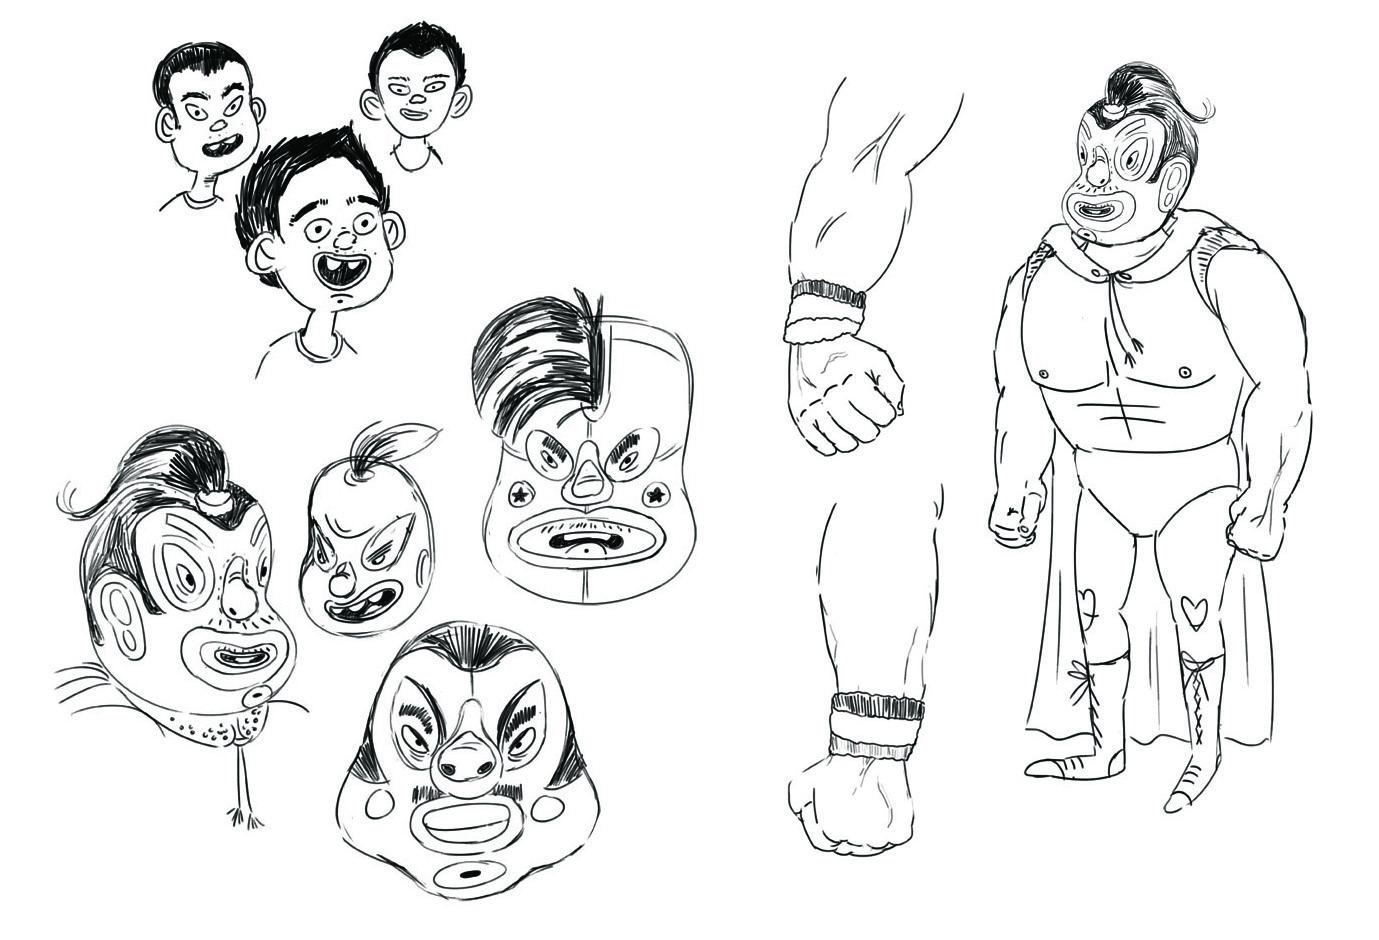 Eduardo sketch studies